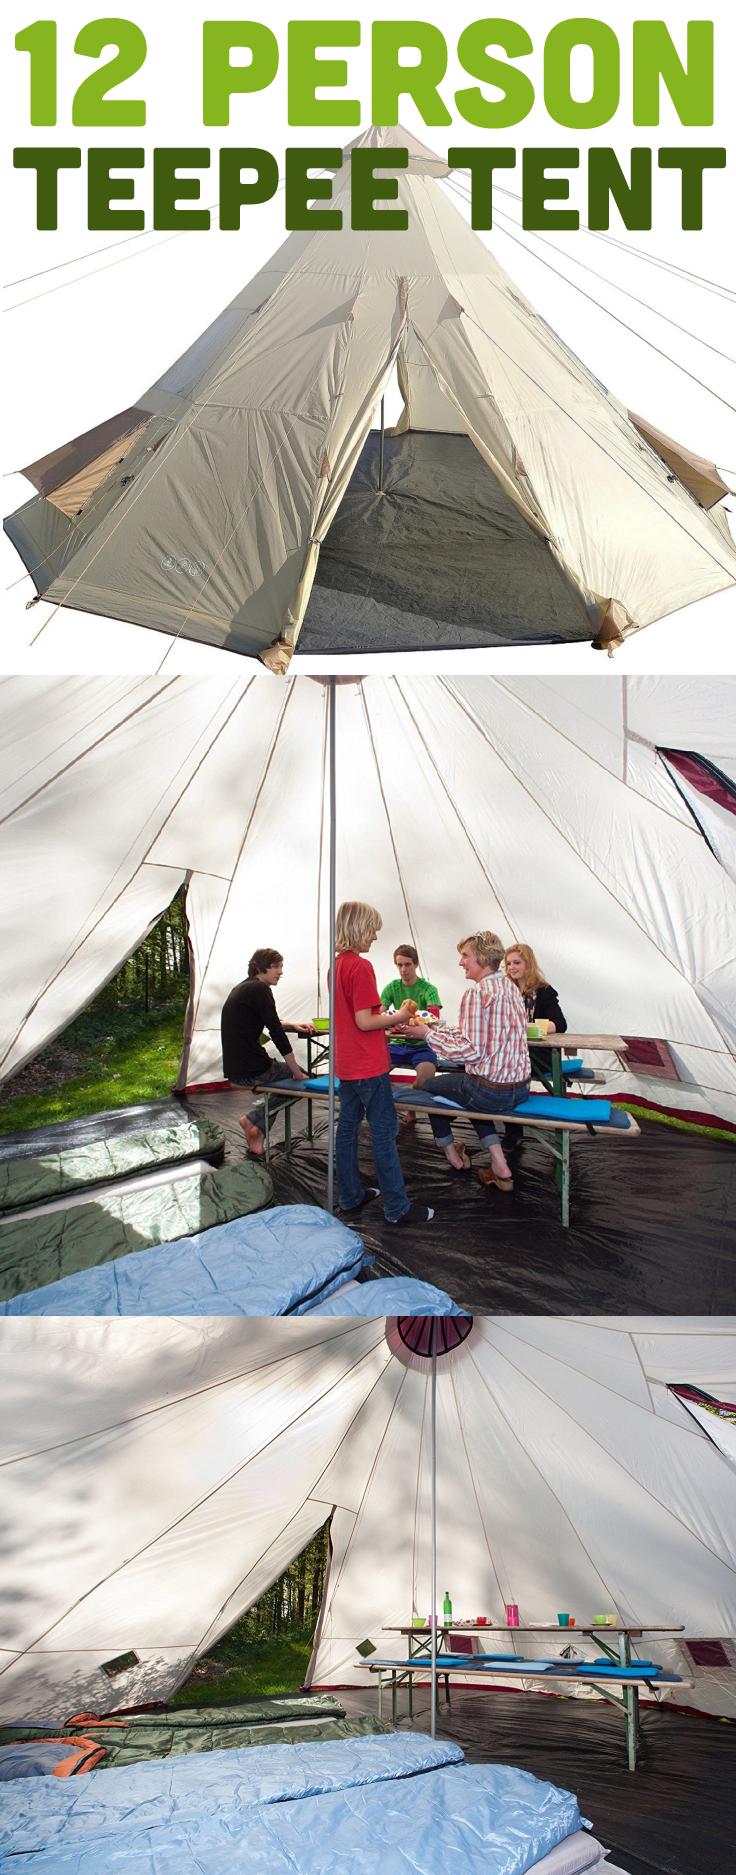 hot sale online 4031b 23268 Tesco 12 Man Teepee Tent £100 @ Tesco Direct   my Disney ...